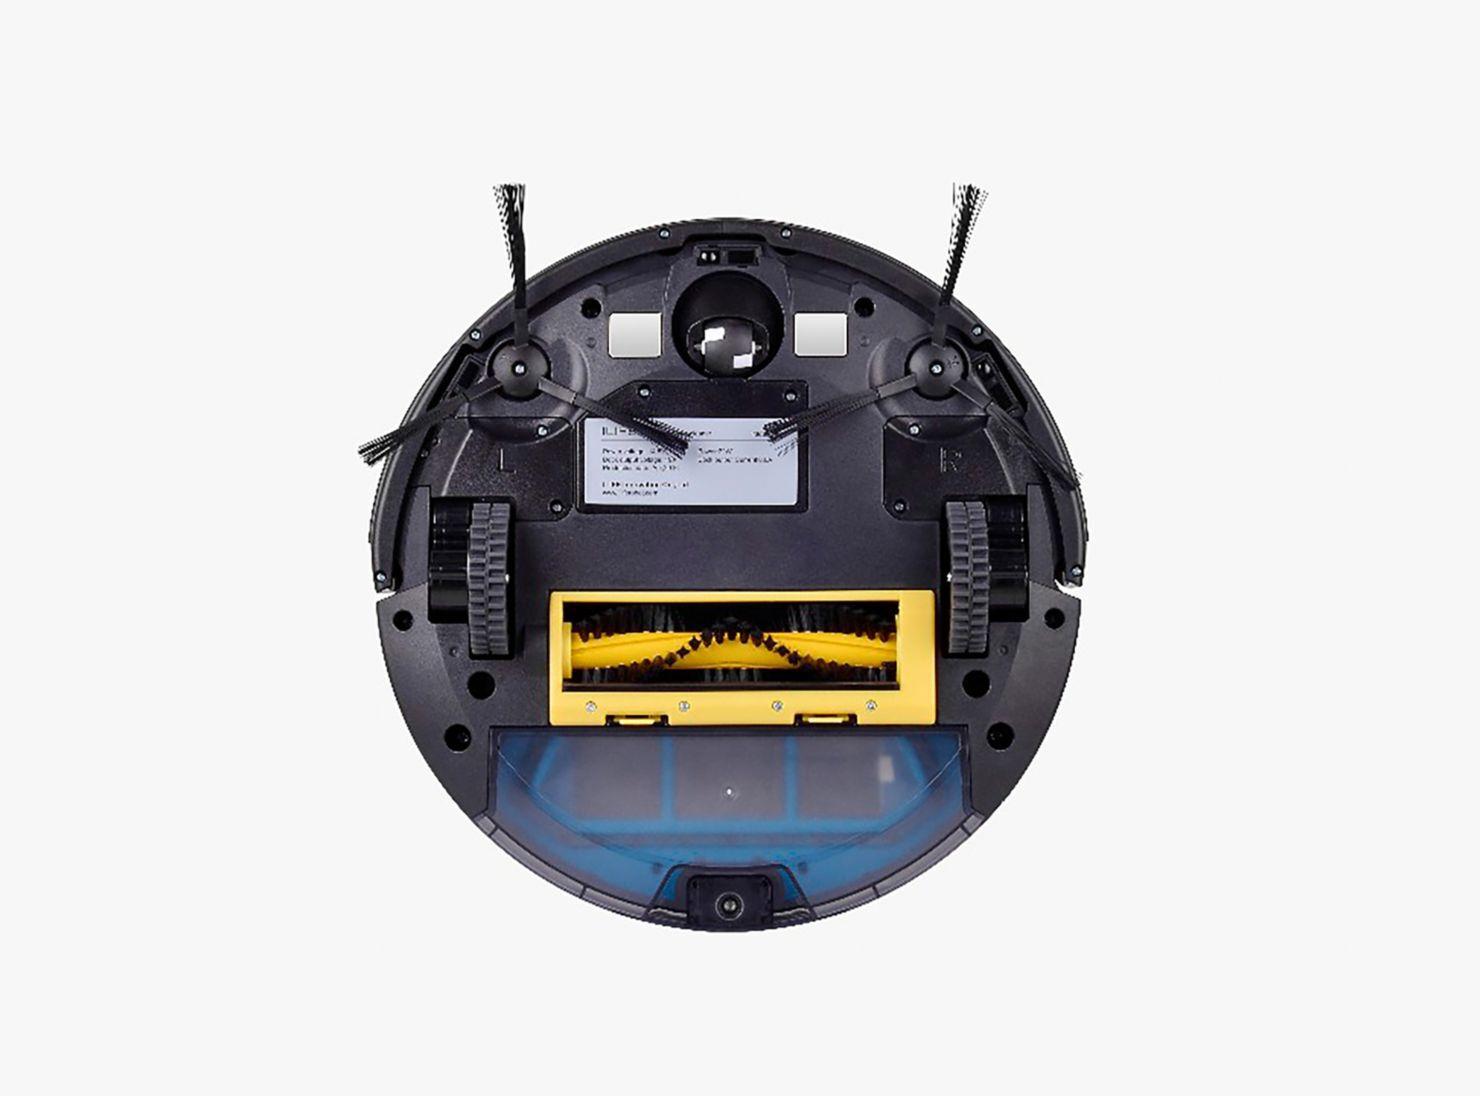 A4s Programable Programable Robot Aspiradora Ilife Robot A4s Programable Aspiradora Aspiradora Robot Ilife 7mfvb6IYgy